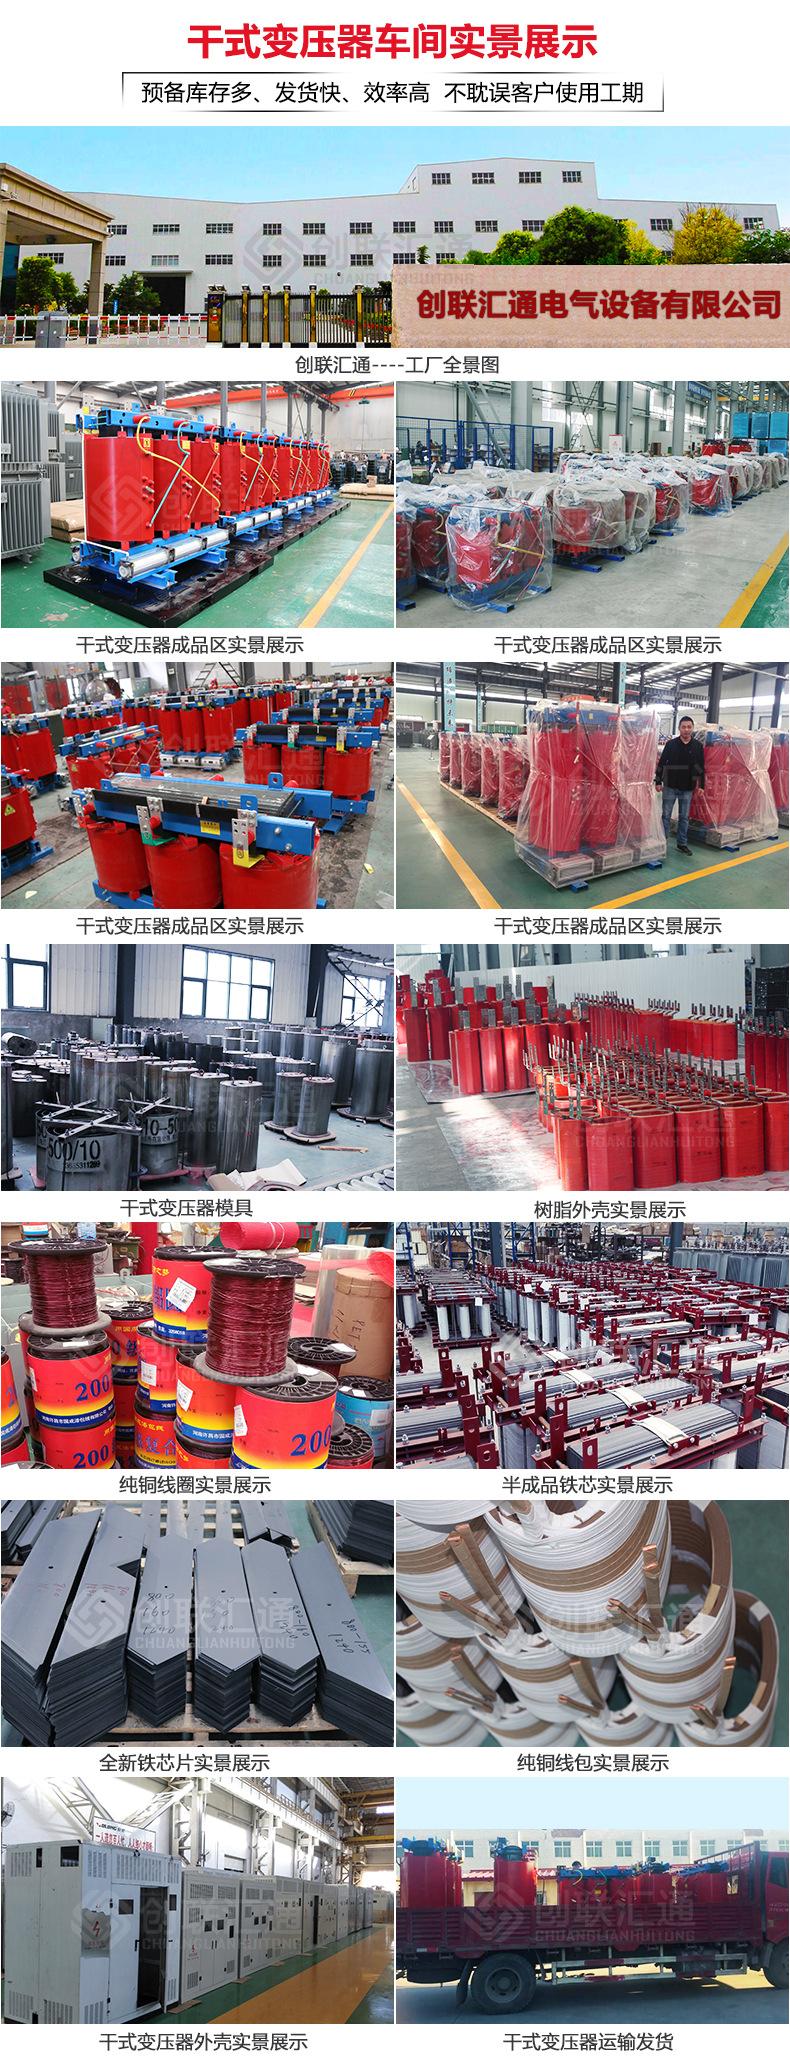 SCB10-250kva/10kv干式变压器 scb10型环氧树脂浇筑 厂家现货直销-创联汇通示例图12